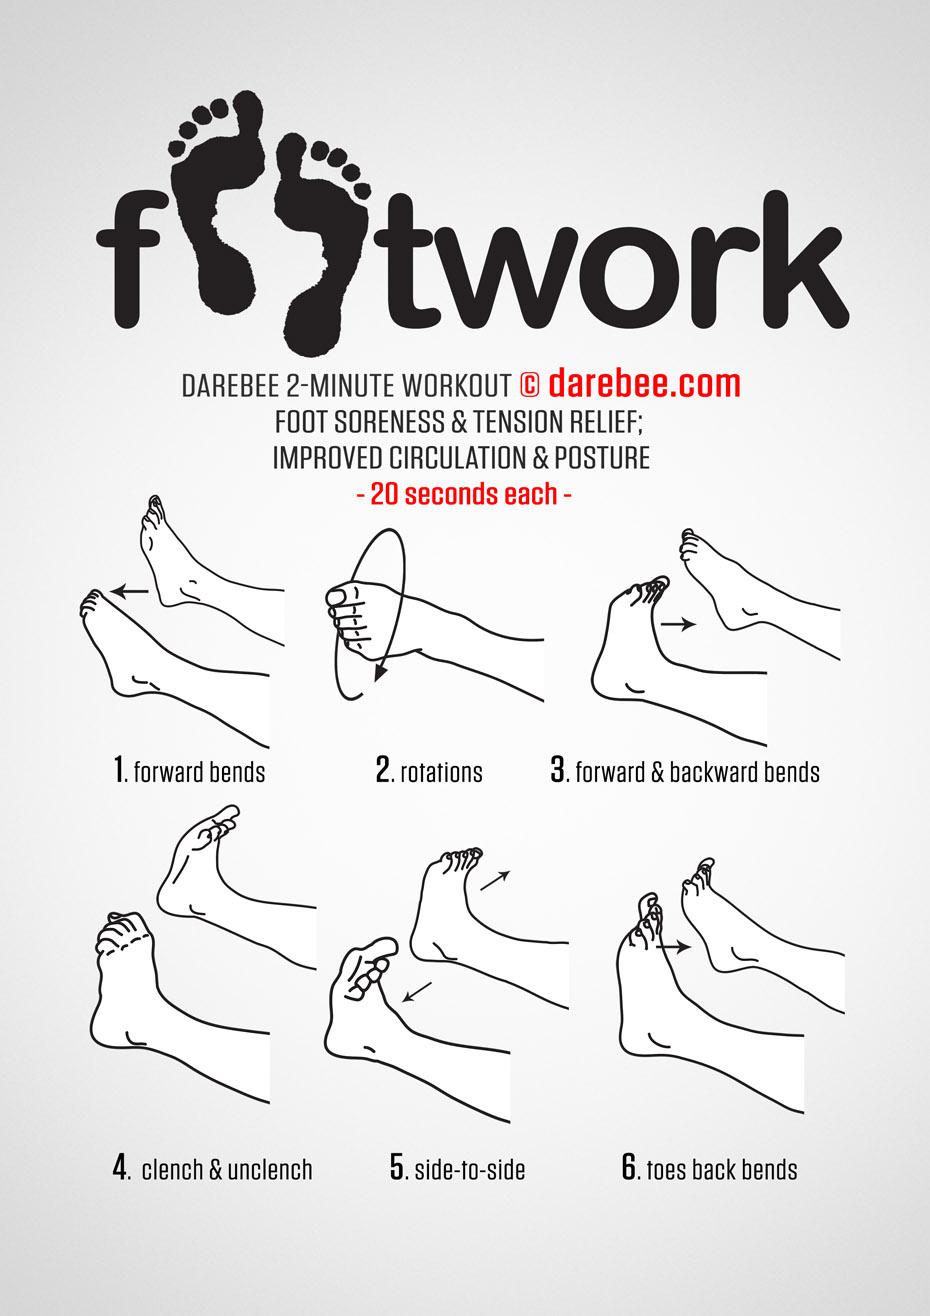 Footwork Workout